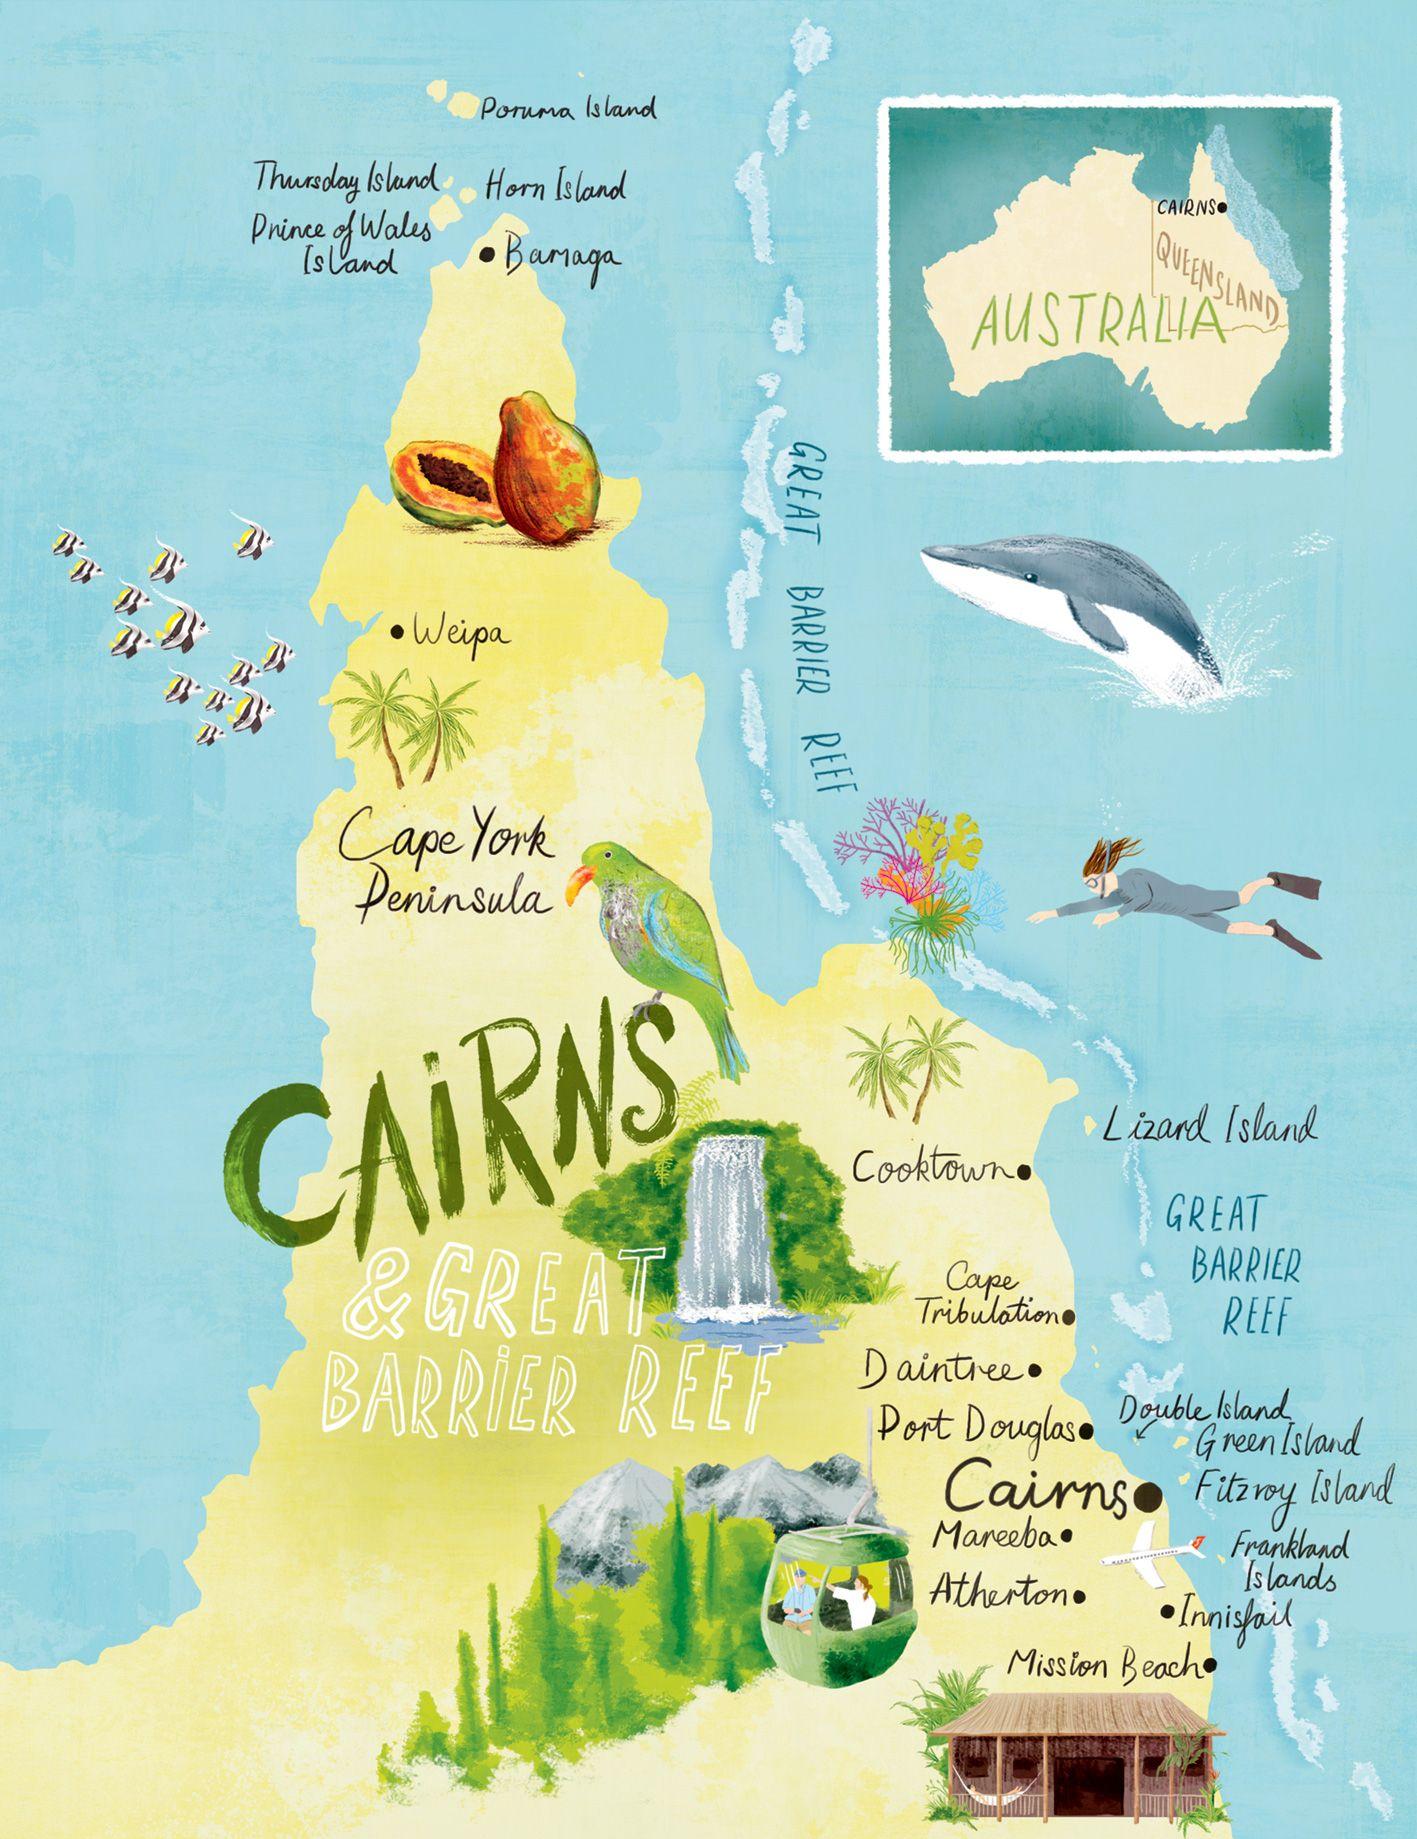 Cairns Great Barrier Reef Map